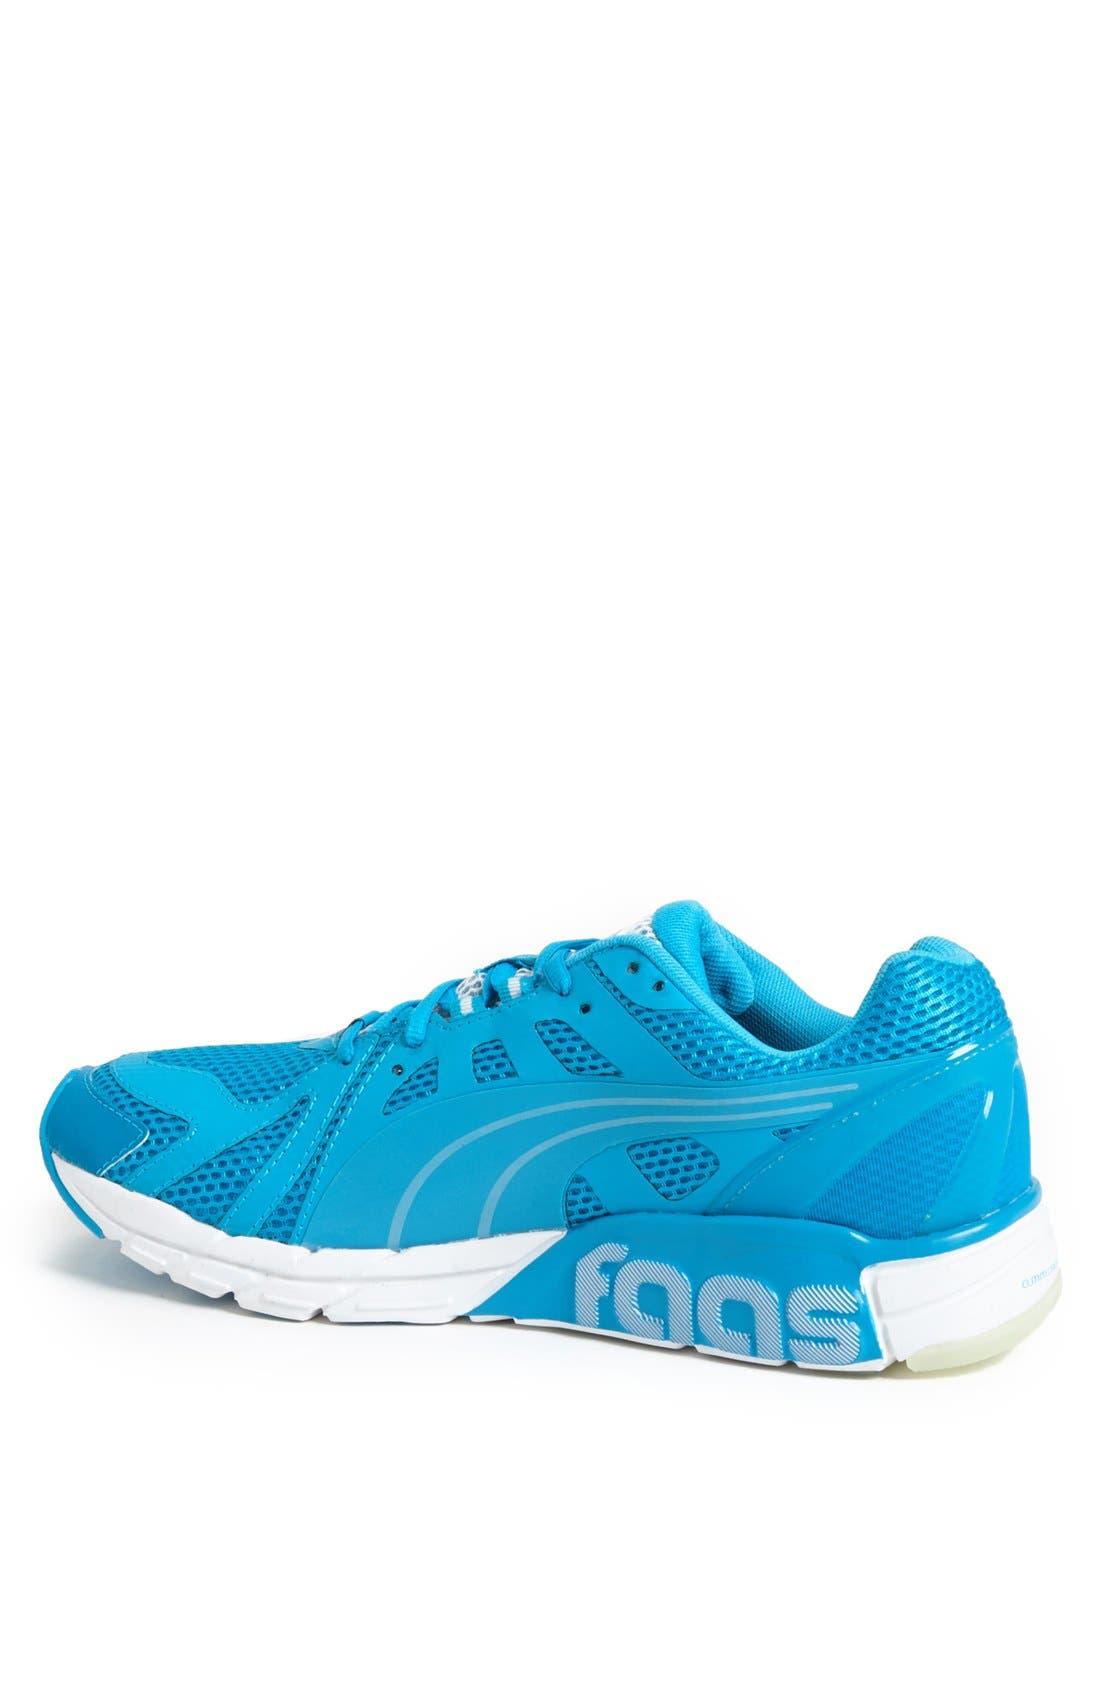 Alternate Image 2  - PUMA 'Faas 600 S Glow' Running Shoe (Men)